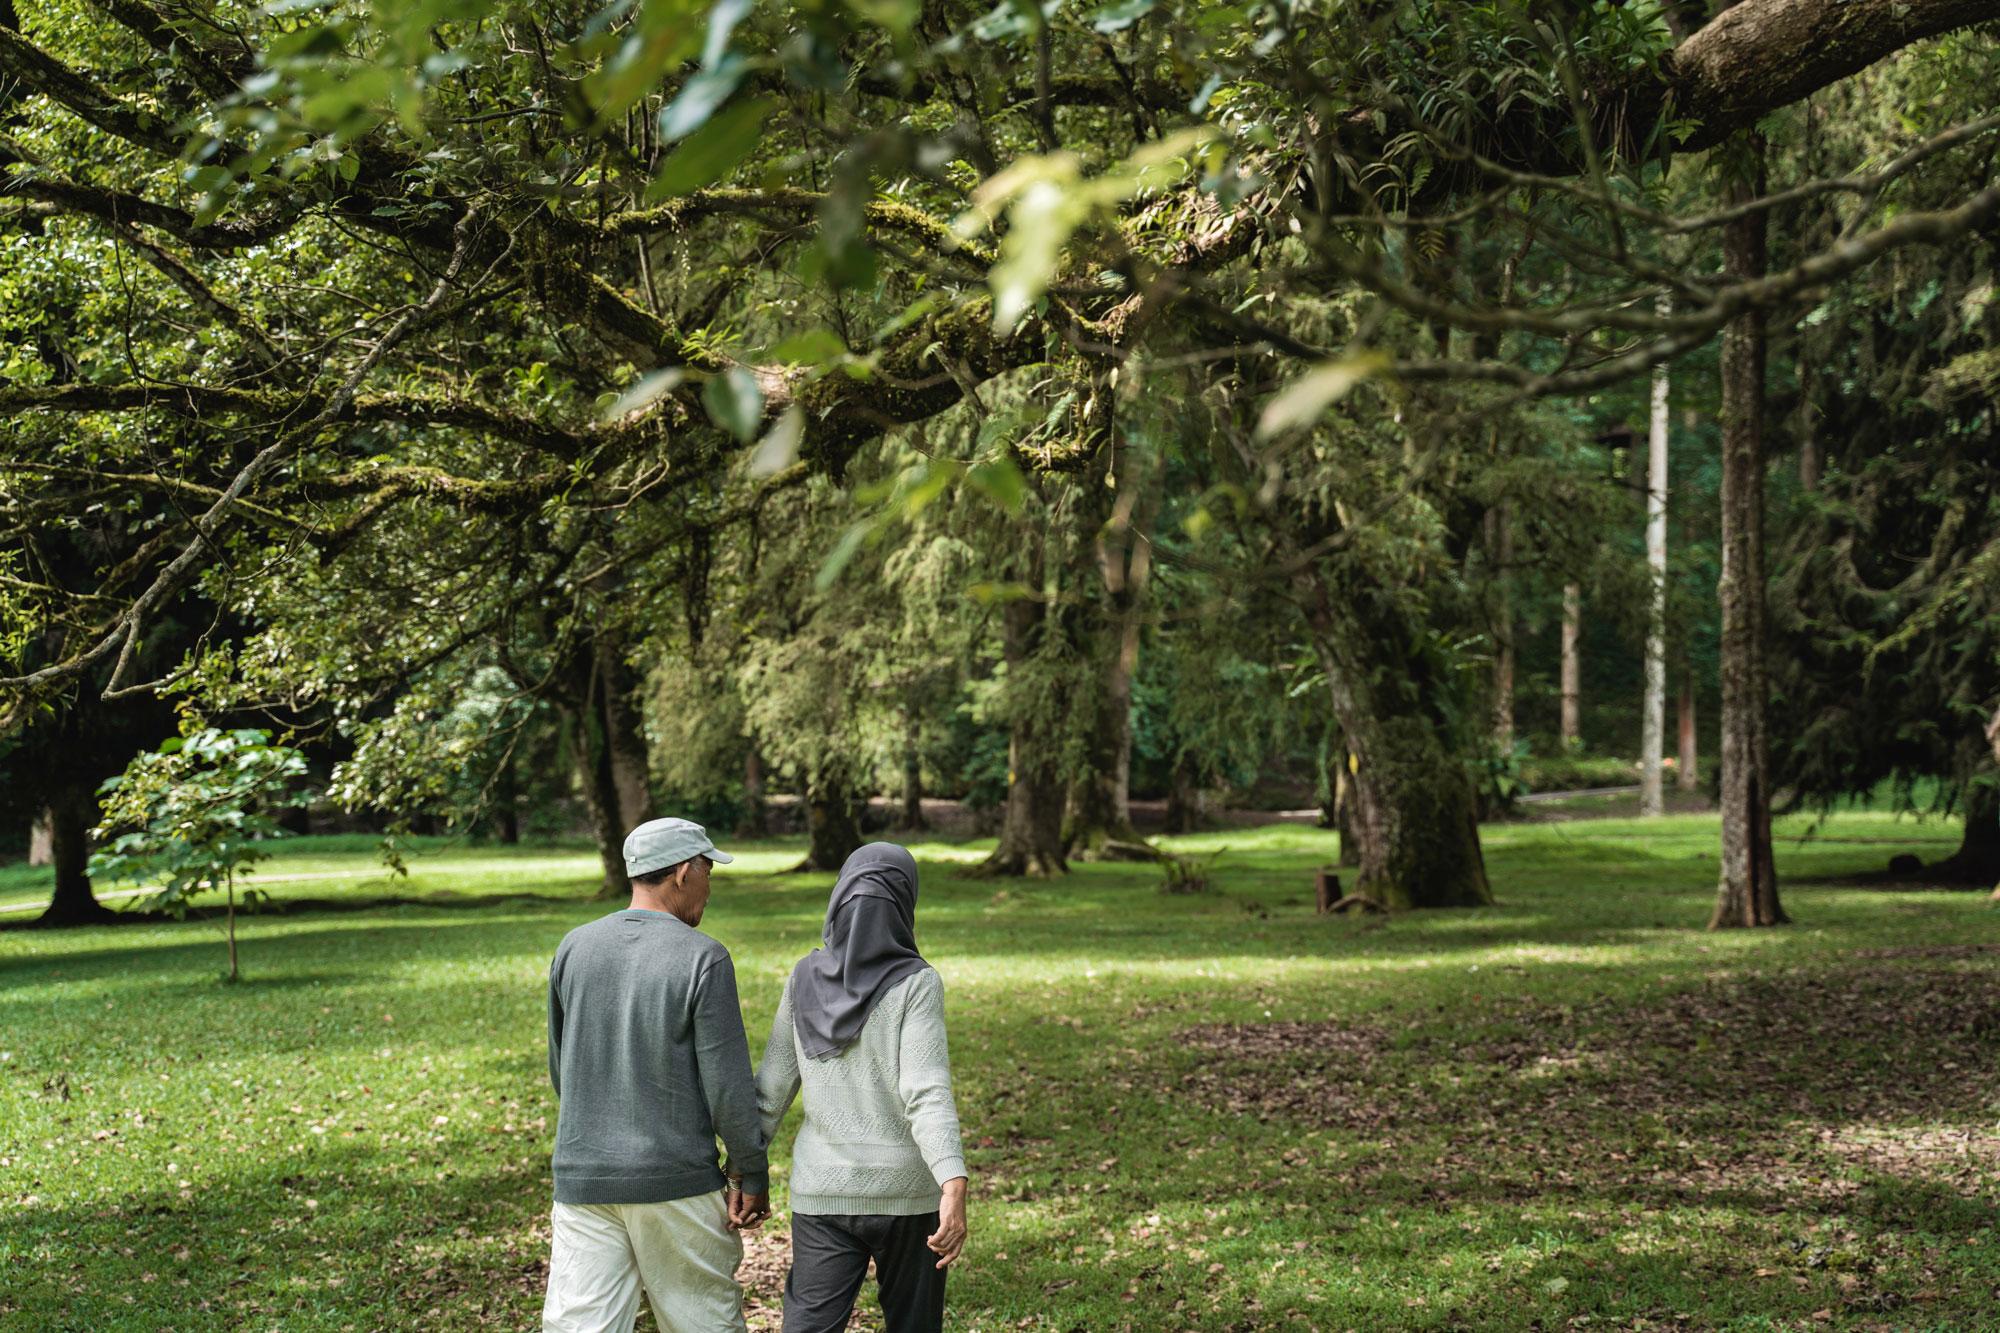 Eldre minoriteter går tur i skogen. Foto